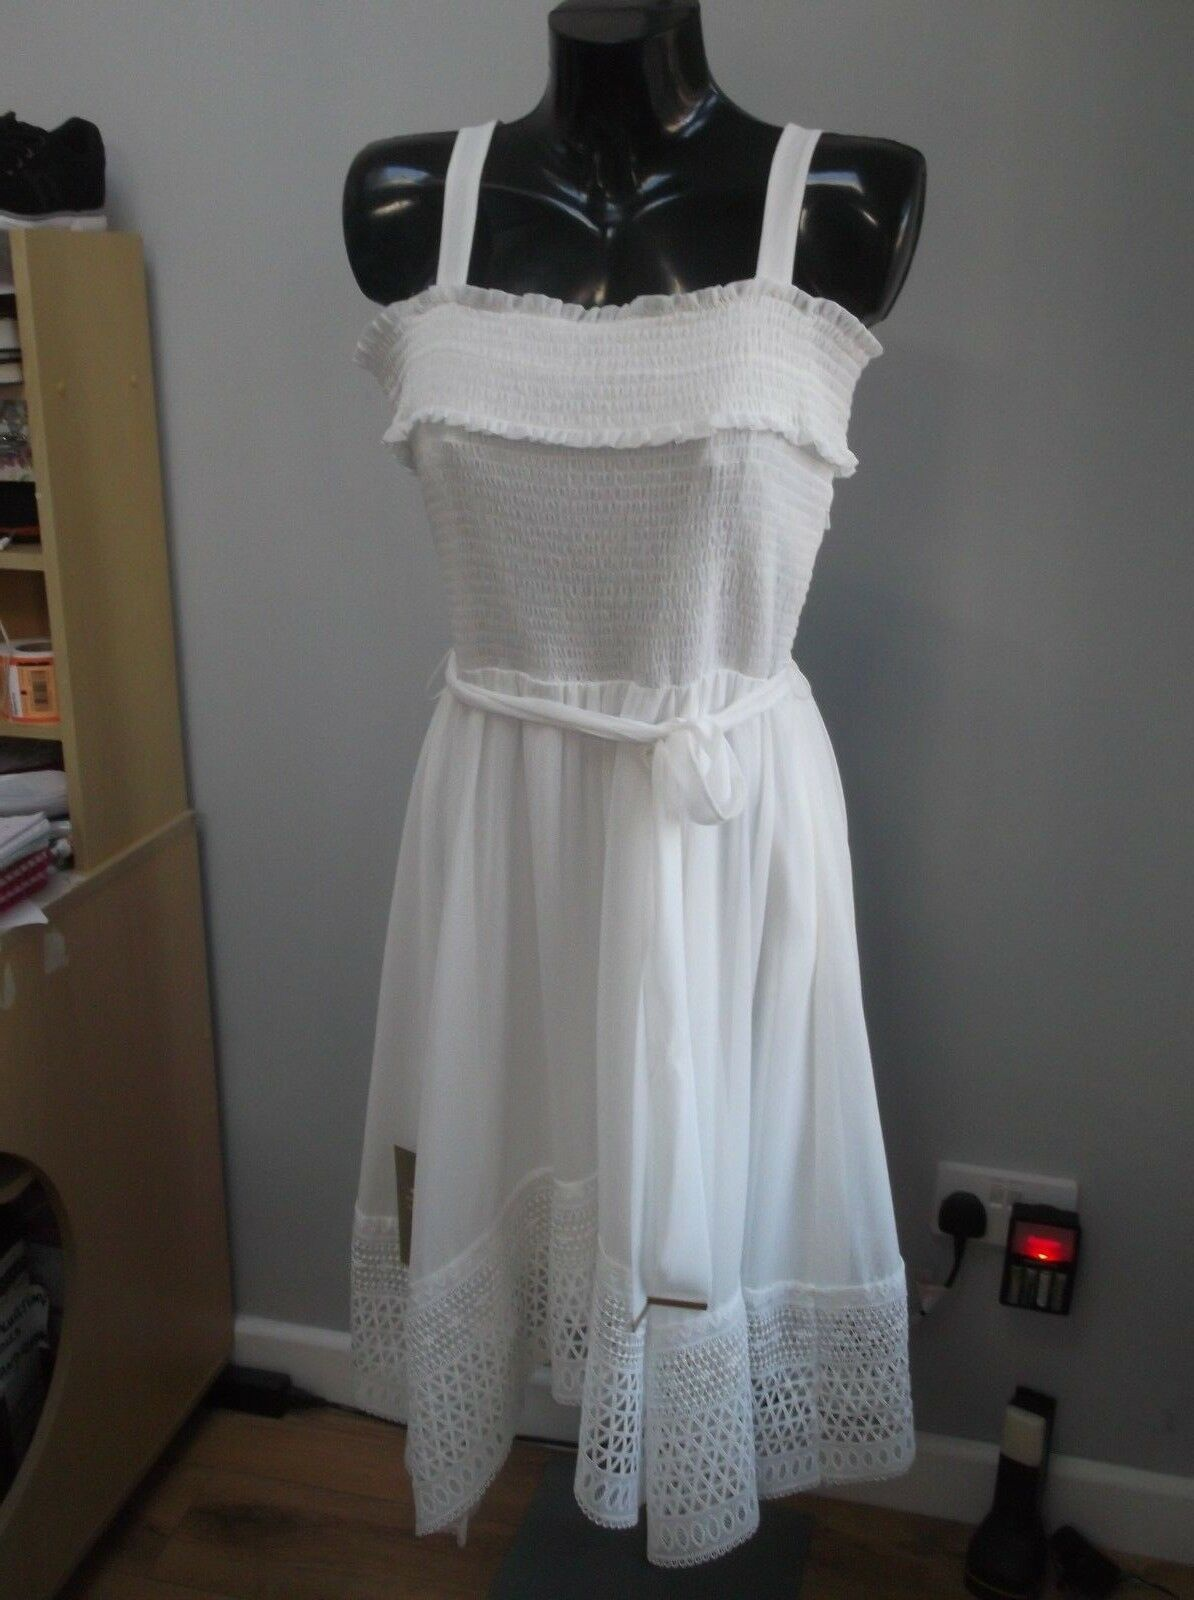 BNWT, fun ivory lace, asymmetric hem summer dress, MYELLA LACE by COAST,